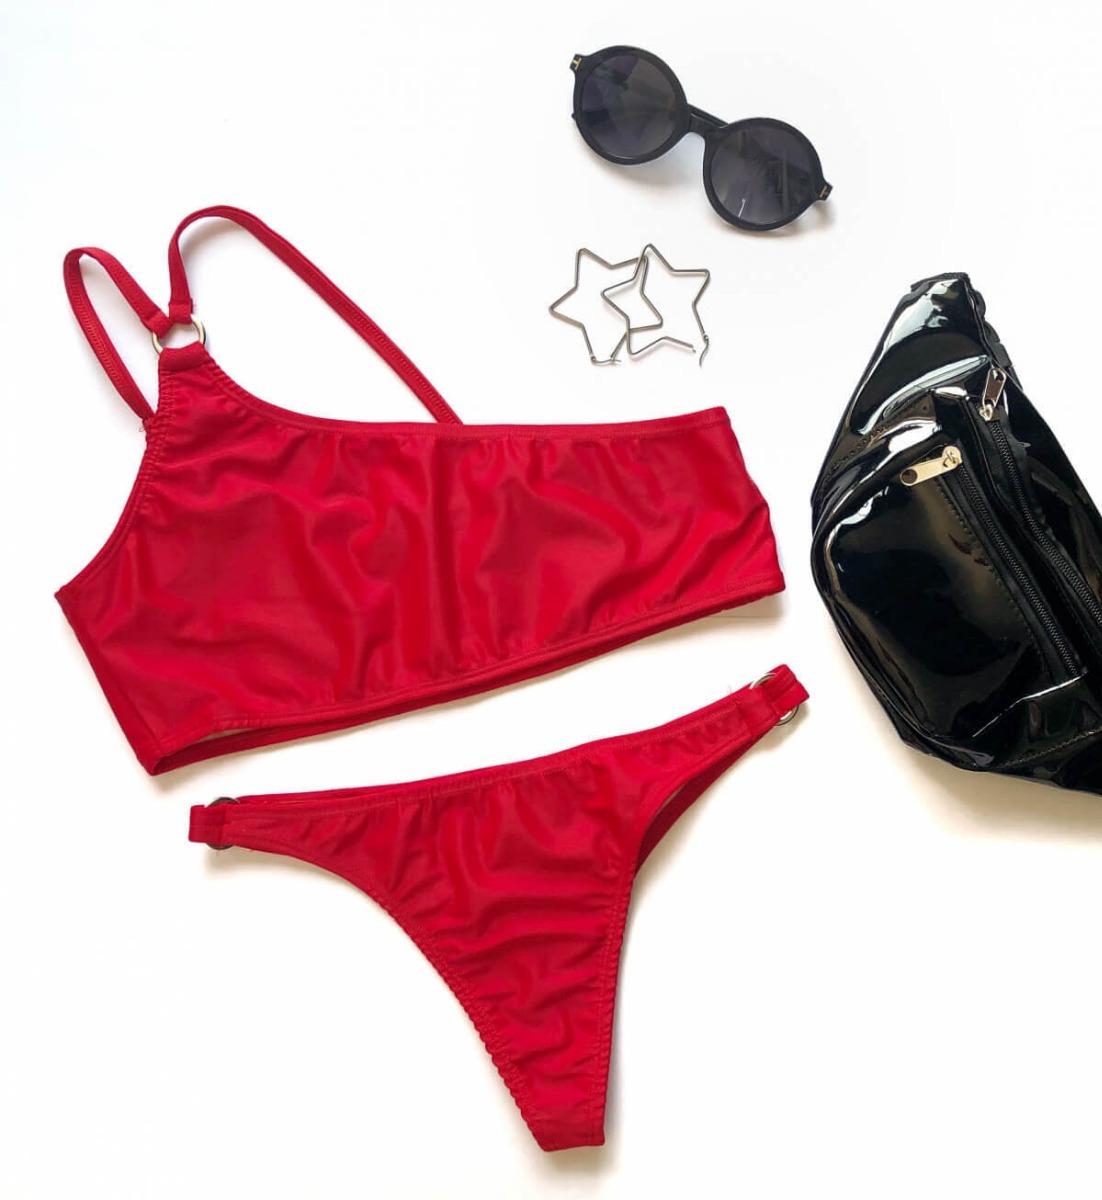 d9c7357ce Características. Marca Indumentaria ChanDion  Modelo Bikini 1 Hombro   Género Mujer  Tipo de traje de baño ...